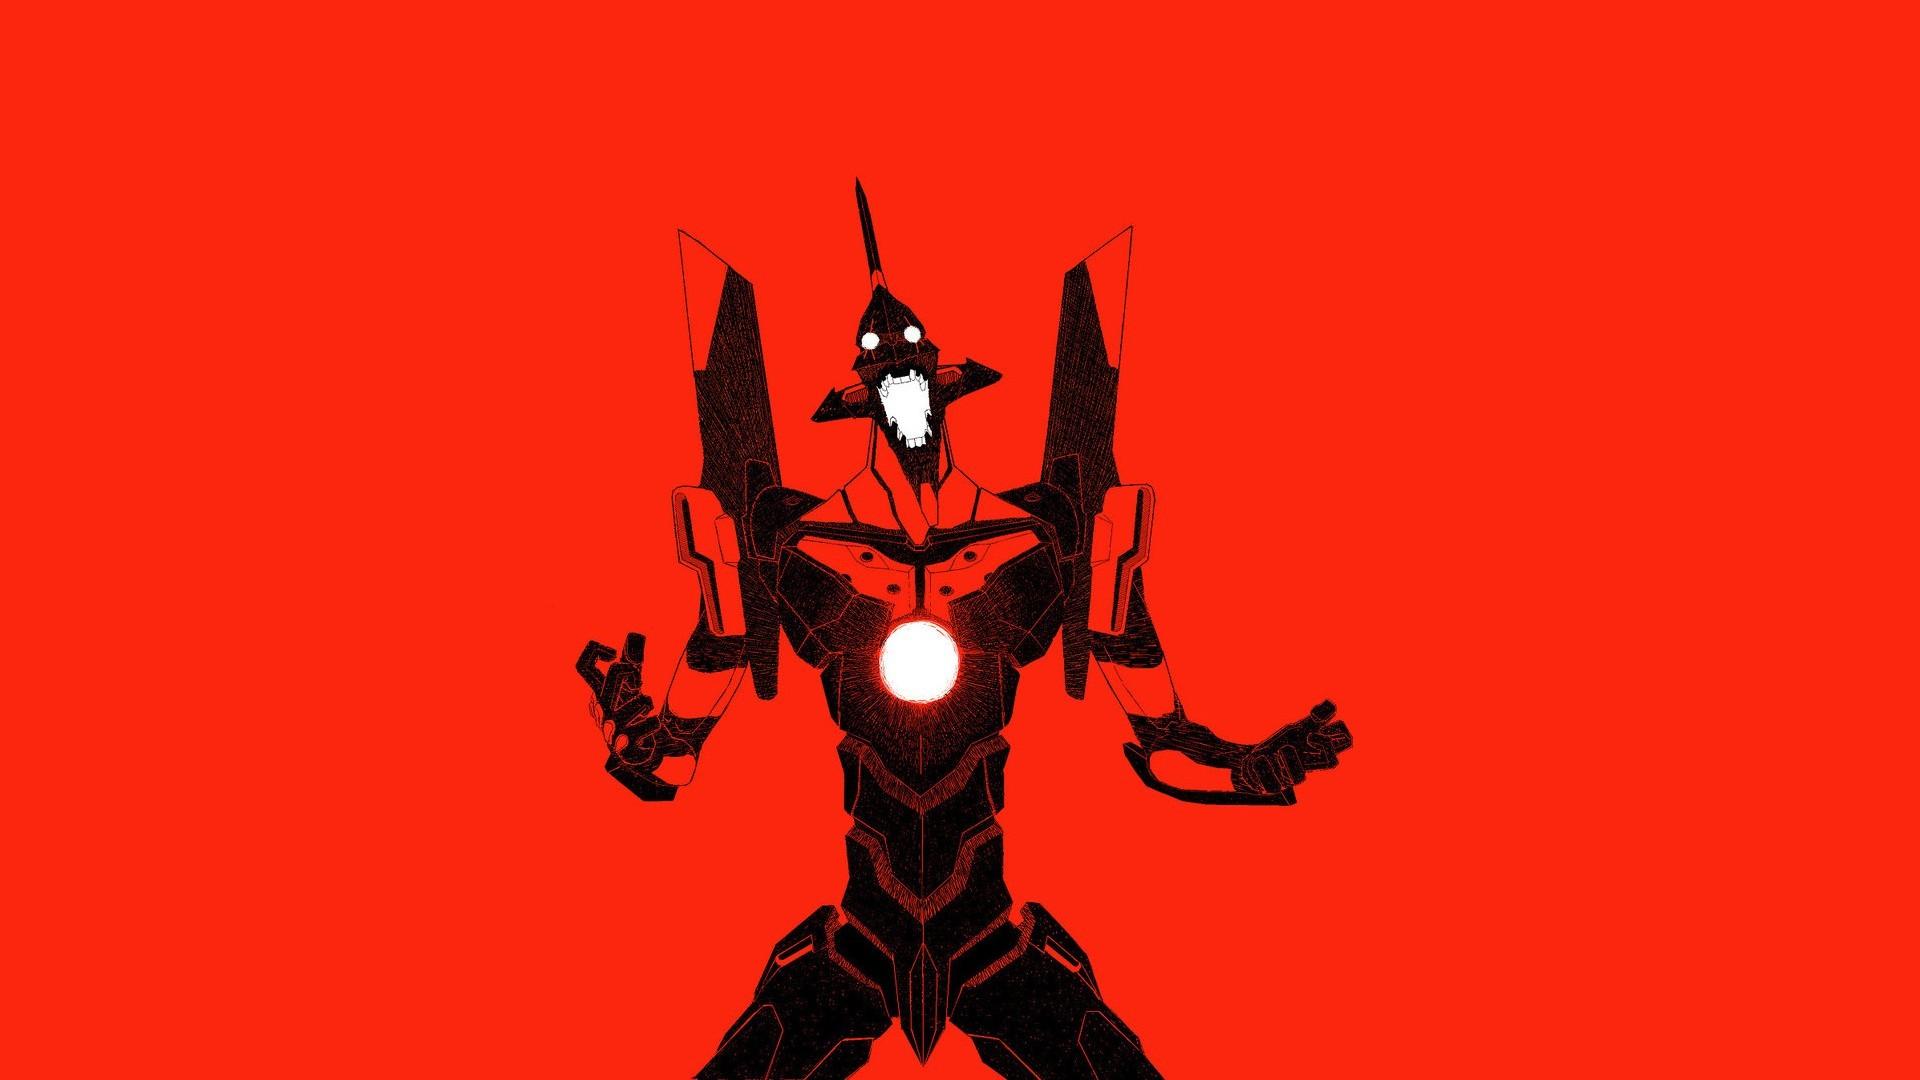 Minimalistic mecha Neon Genesis Evangelion anime EVA Unit 01 red background  wallpaper | | 198840 | WallpaperUP